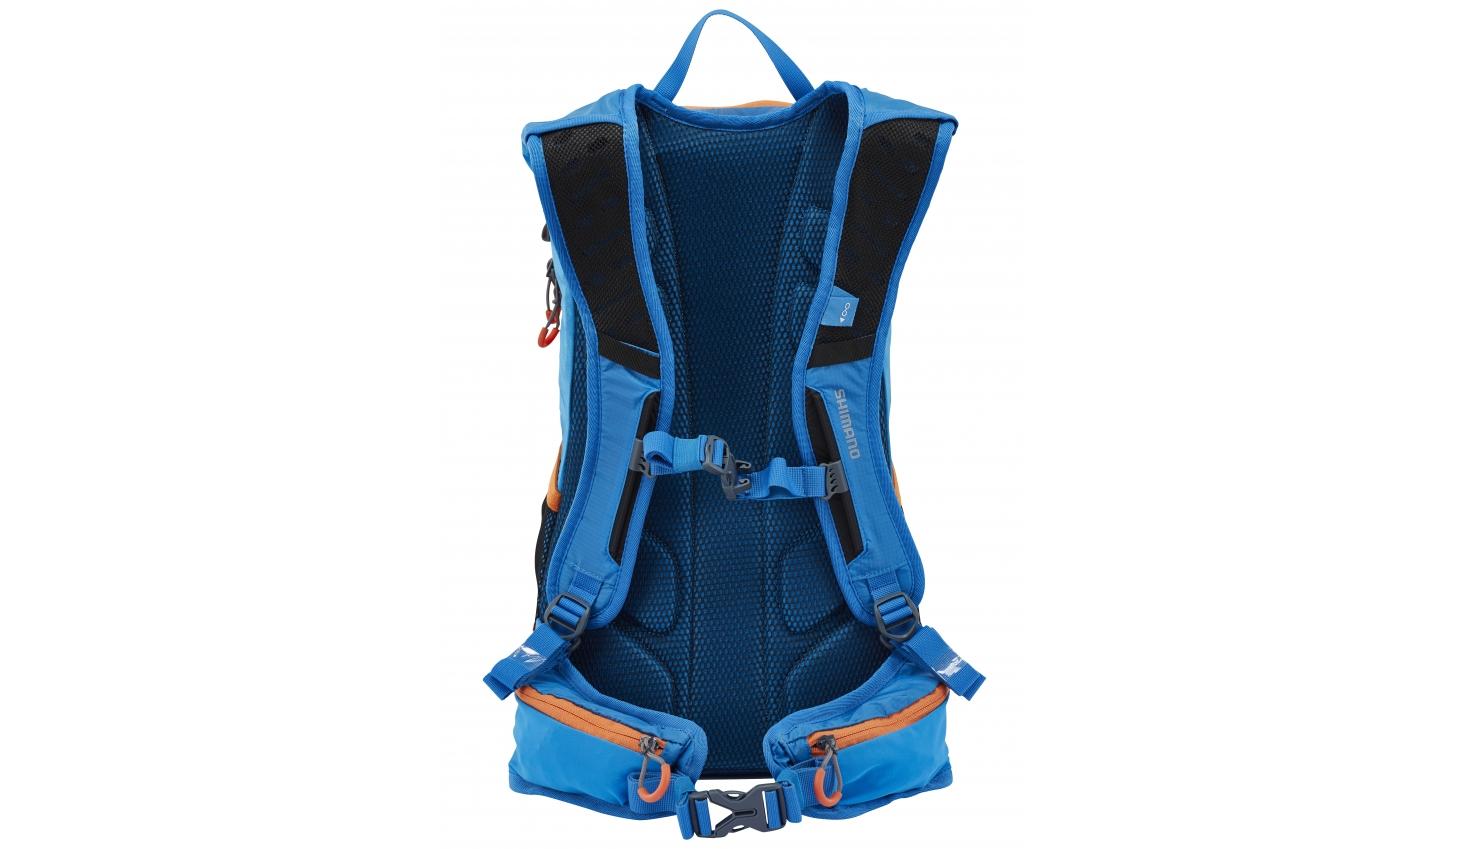 Shimano_Rokko_II_Backpack_16_L_lightning_blau_orange_02[1470x849]